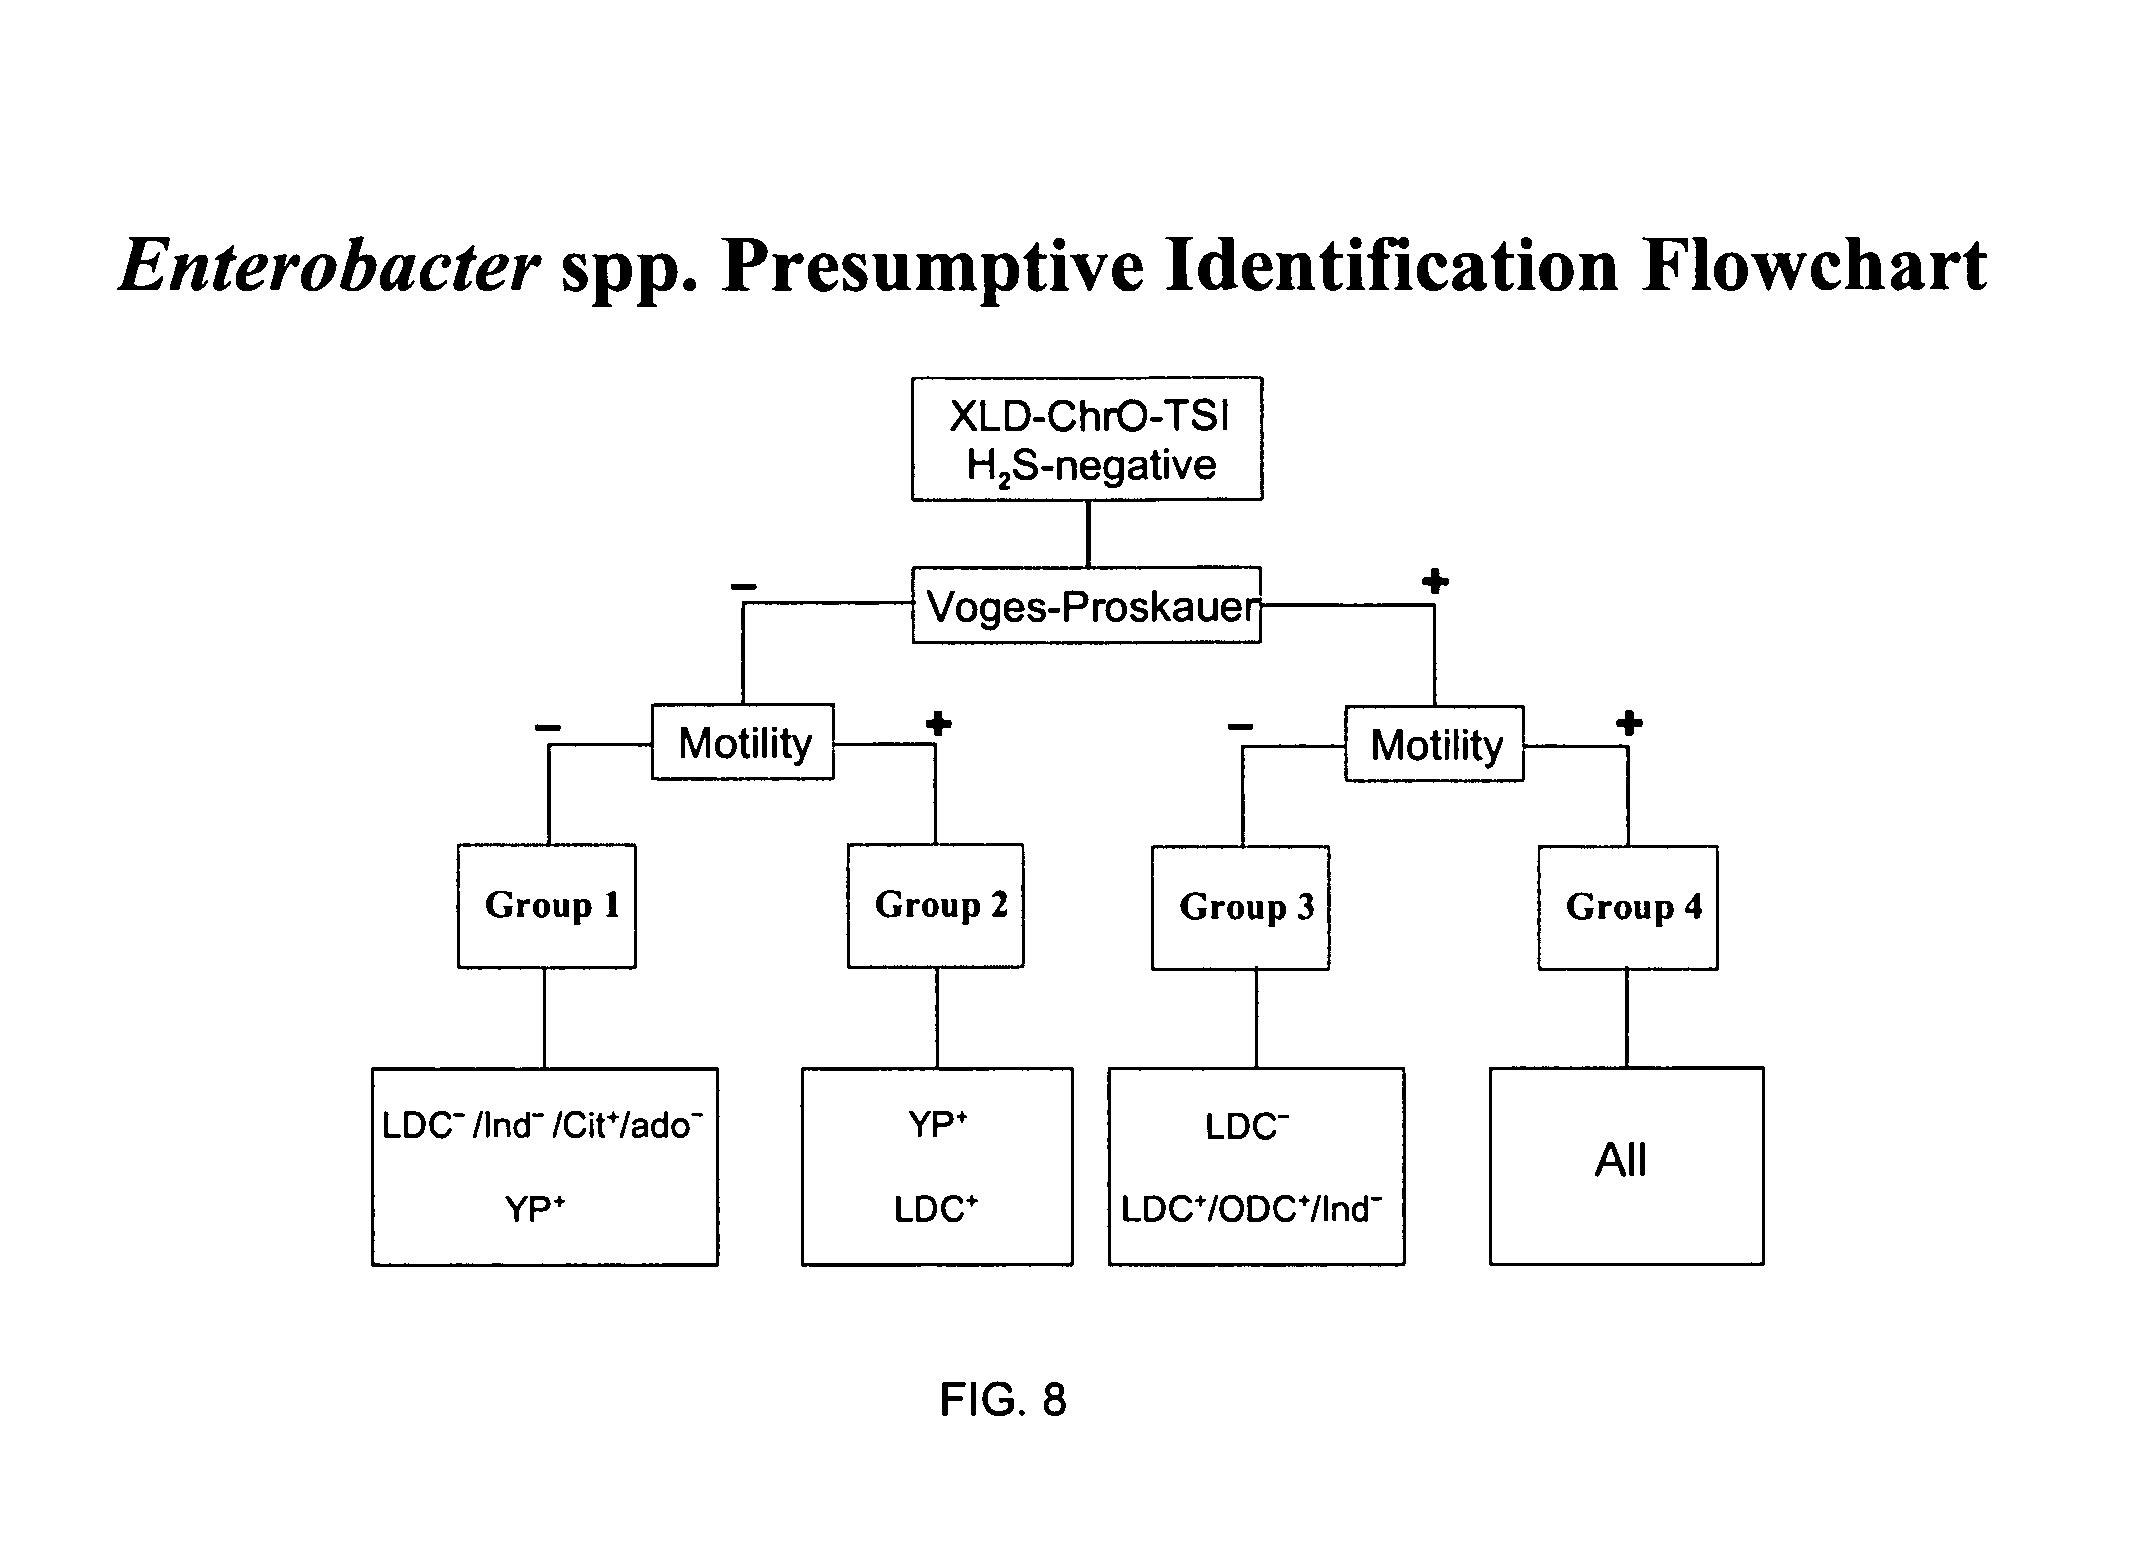 Patent Us7470520 Method For Enterobacter Identification